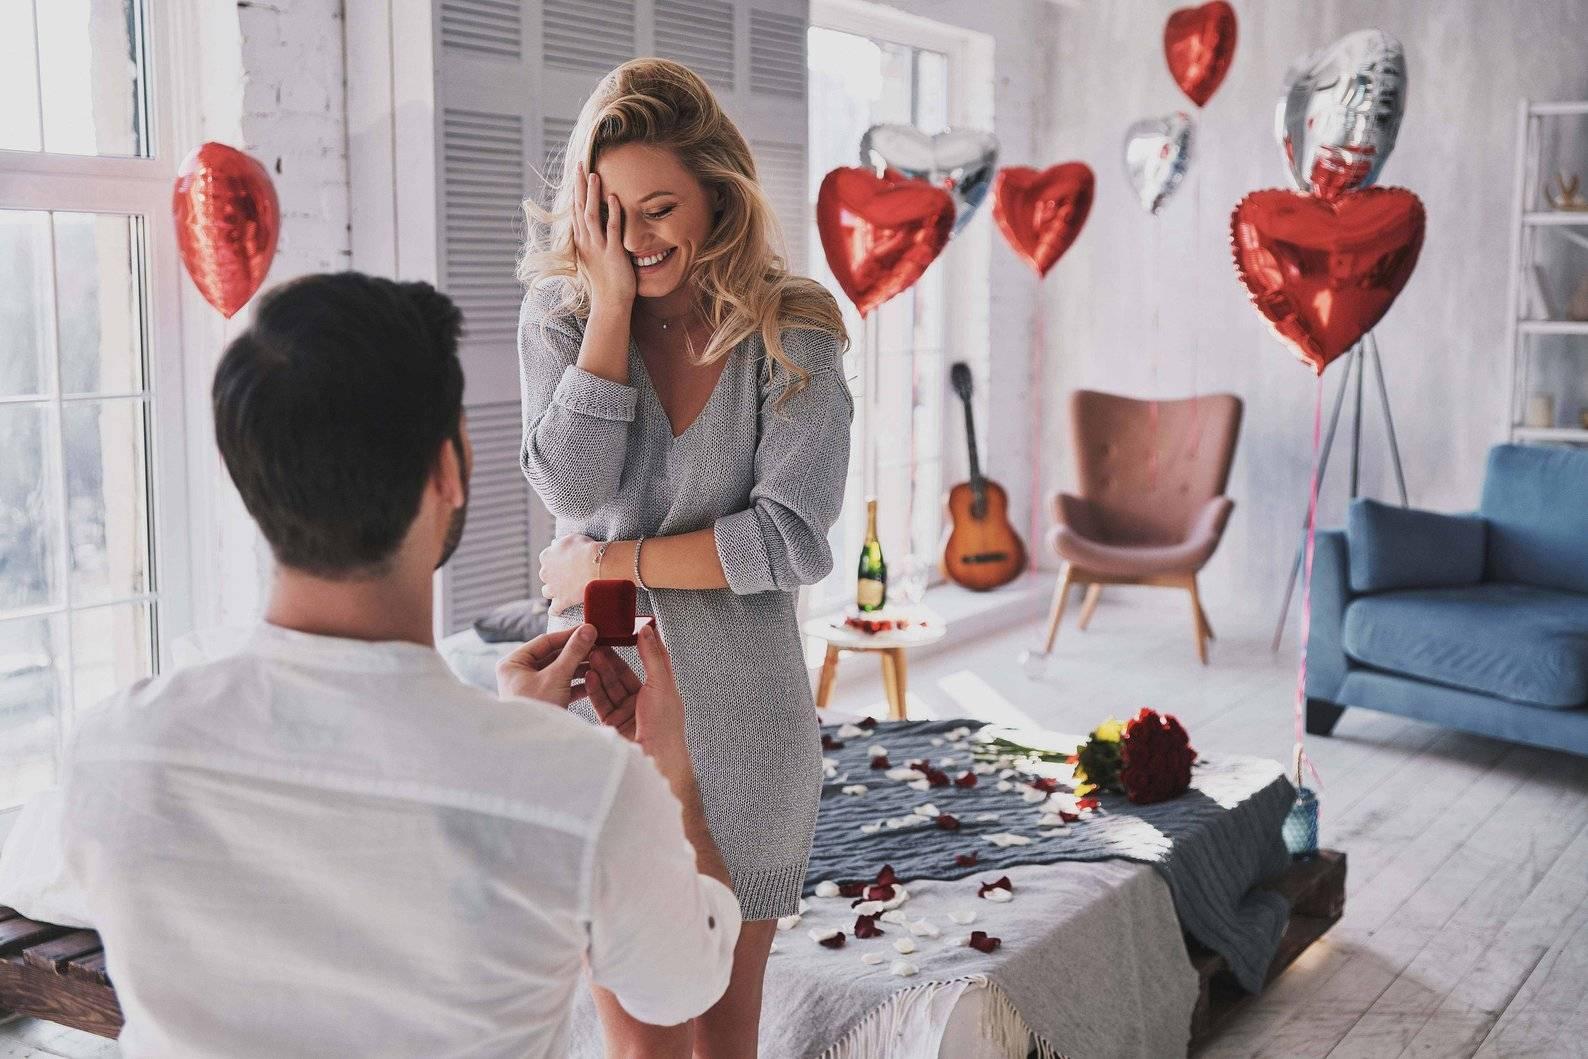 Wedding Proposal Decorations Balloons